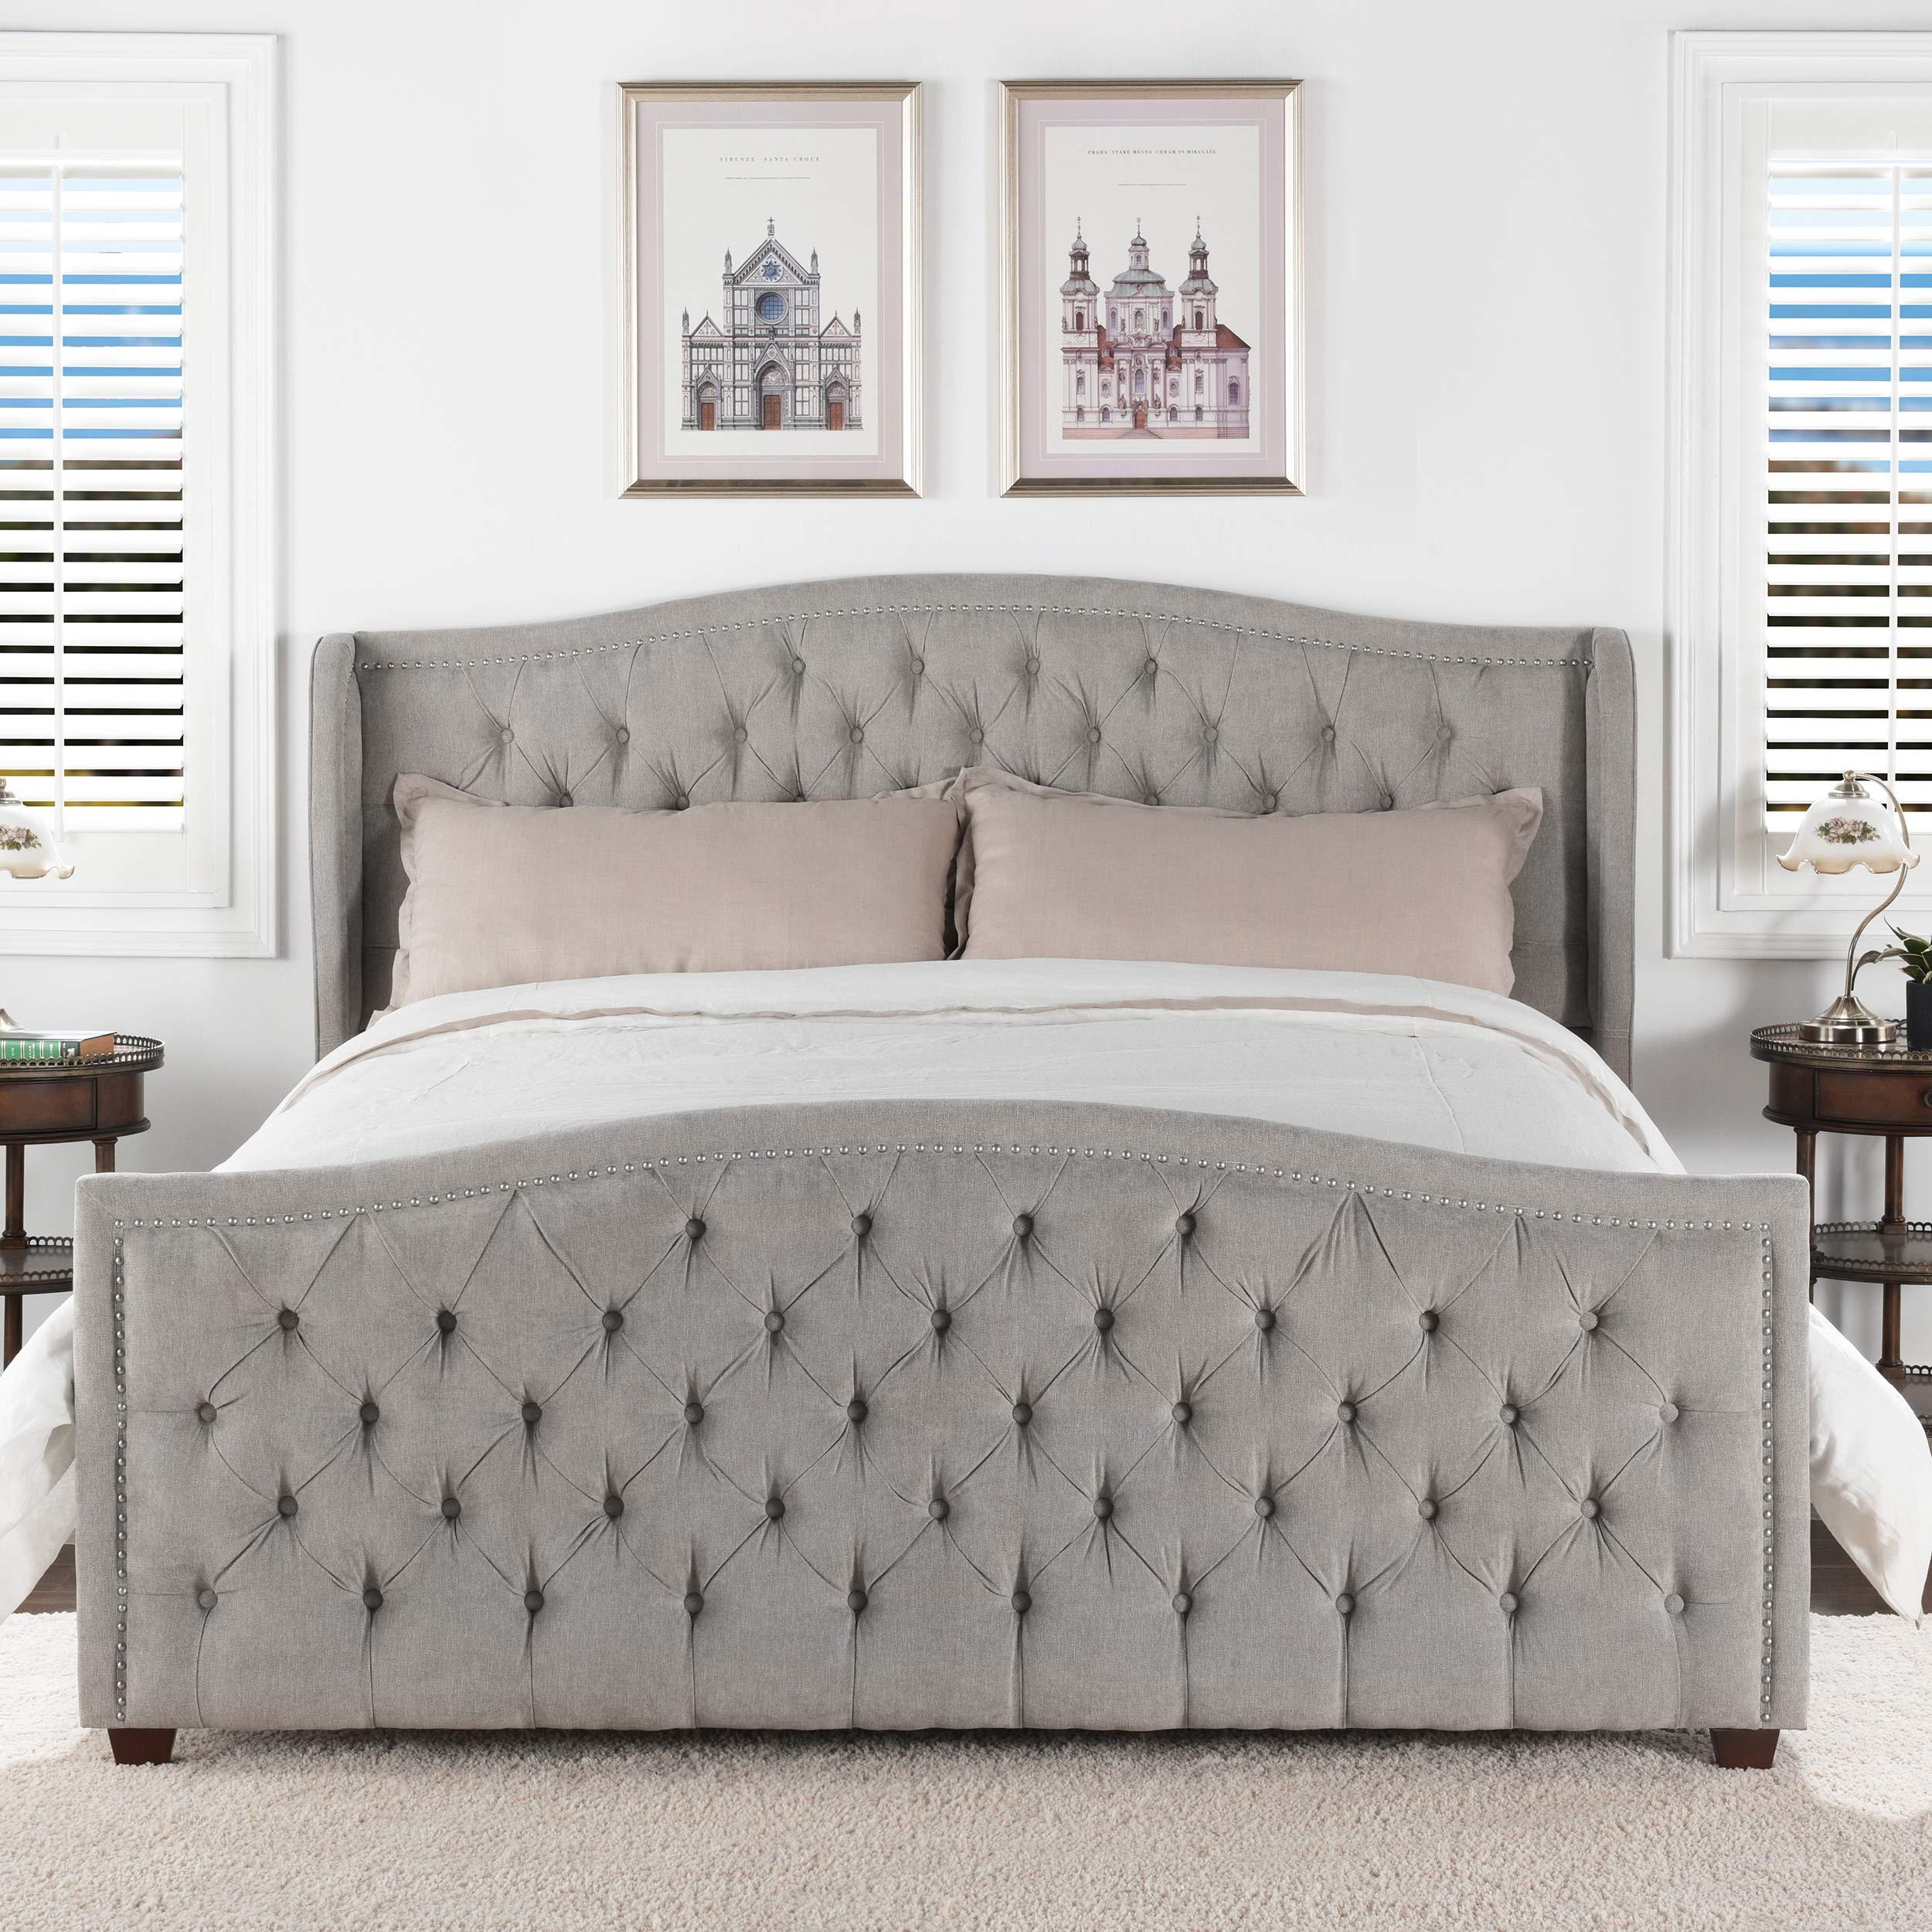 Jennifer Taylor Home Marcella Tufted Wingback King Bed, Silver Grey by Jennifer Taylor Home